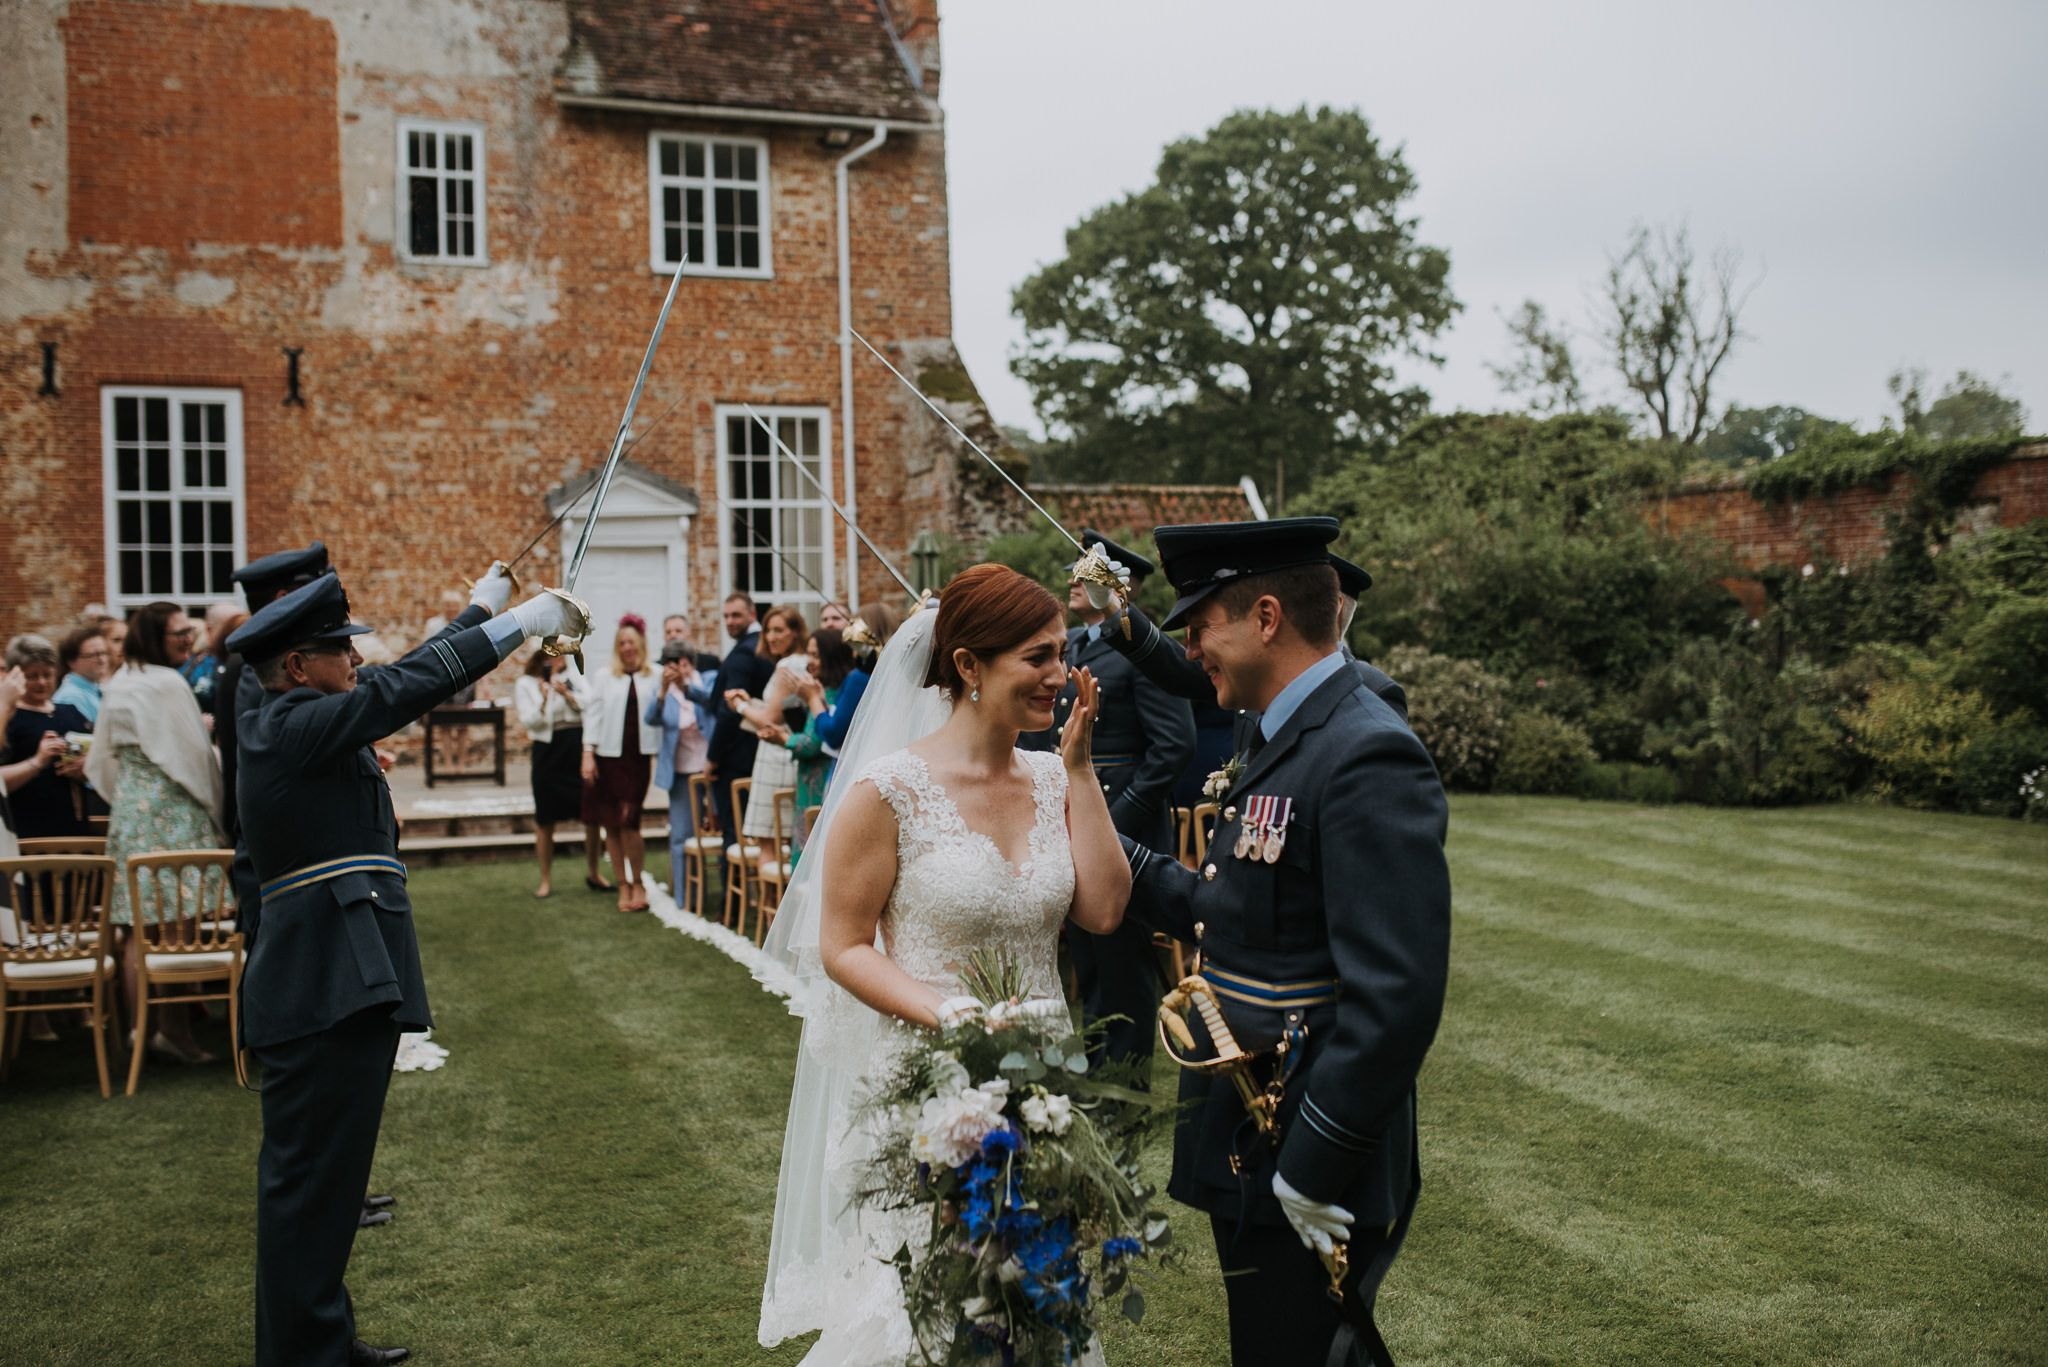 Leeds-castleford-documentary-wedding-photographer-4.jpg